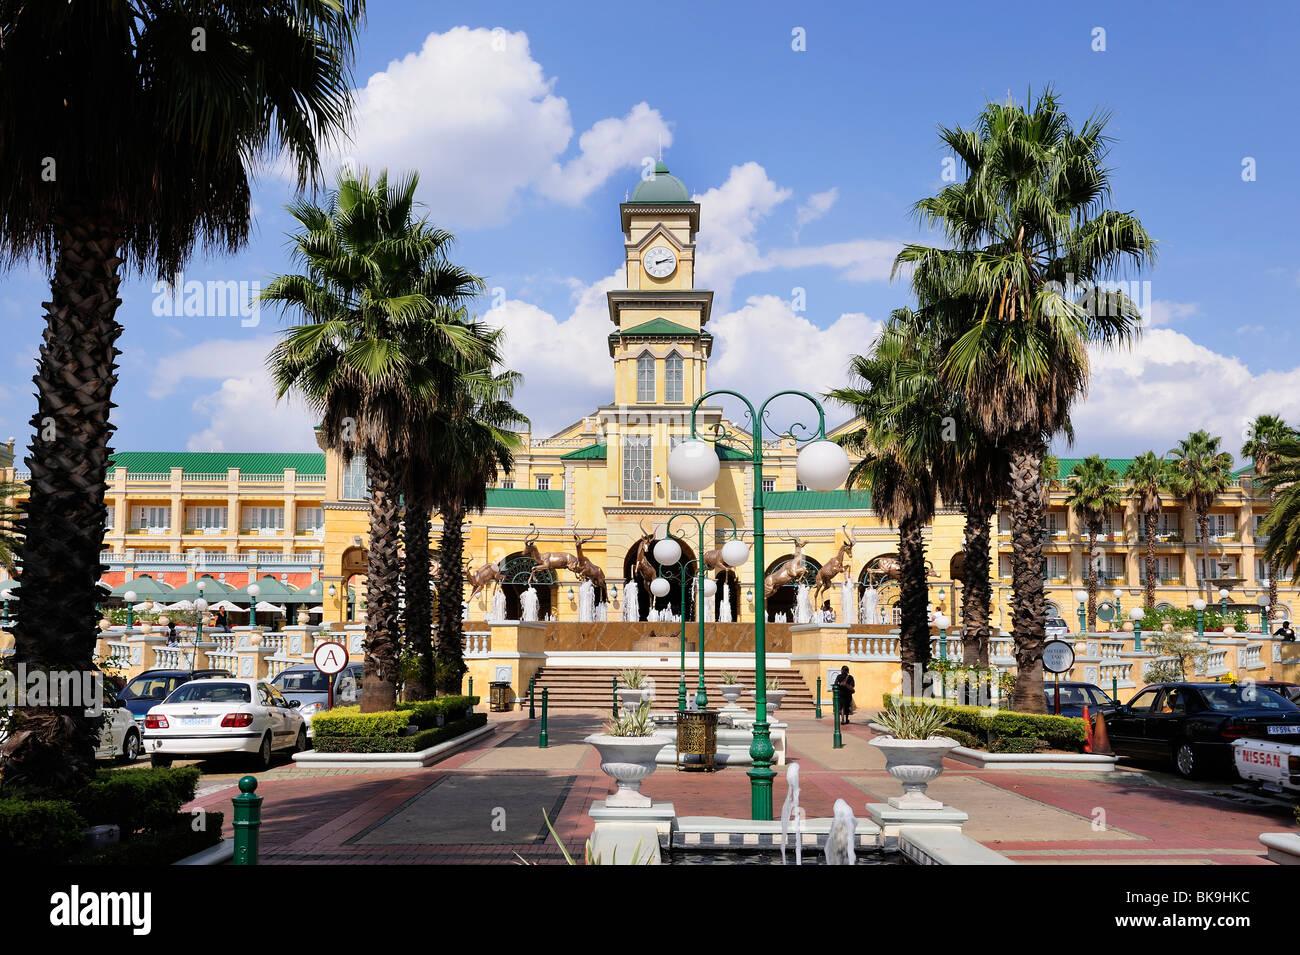 Golden Reef City Casino, Johannesburg, Sud Africa Immagini Stock